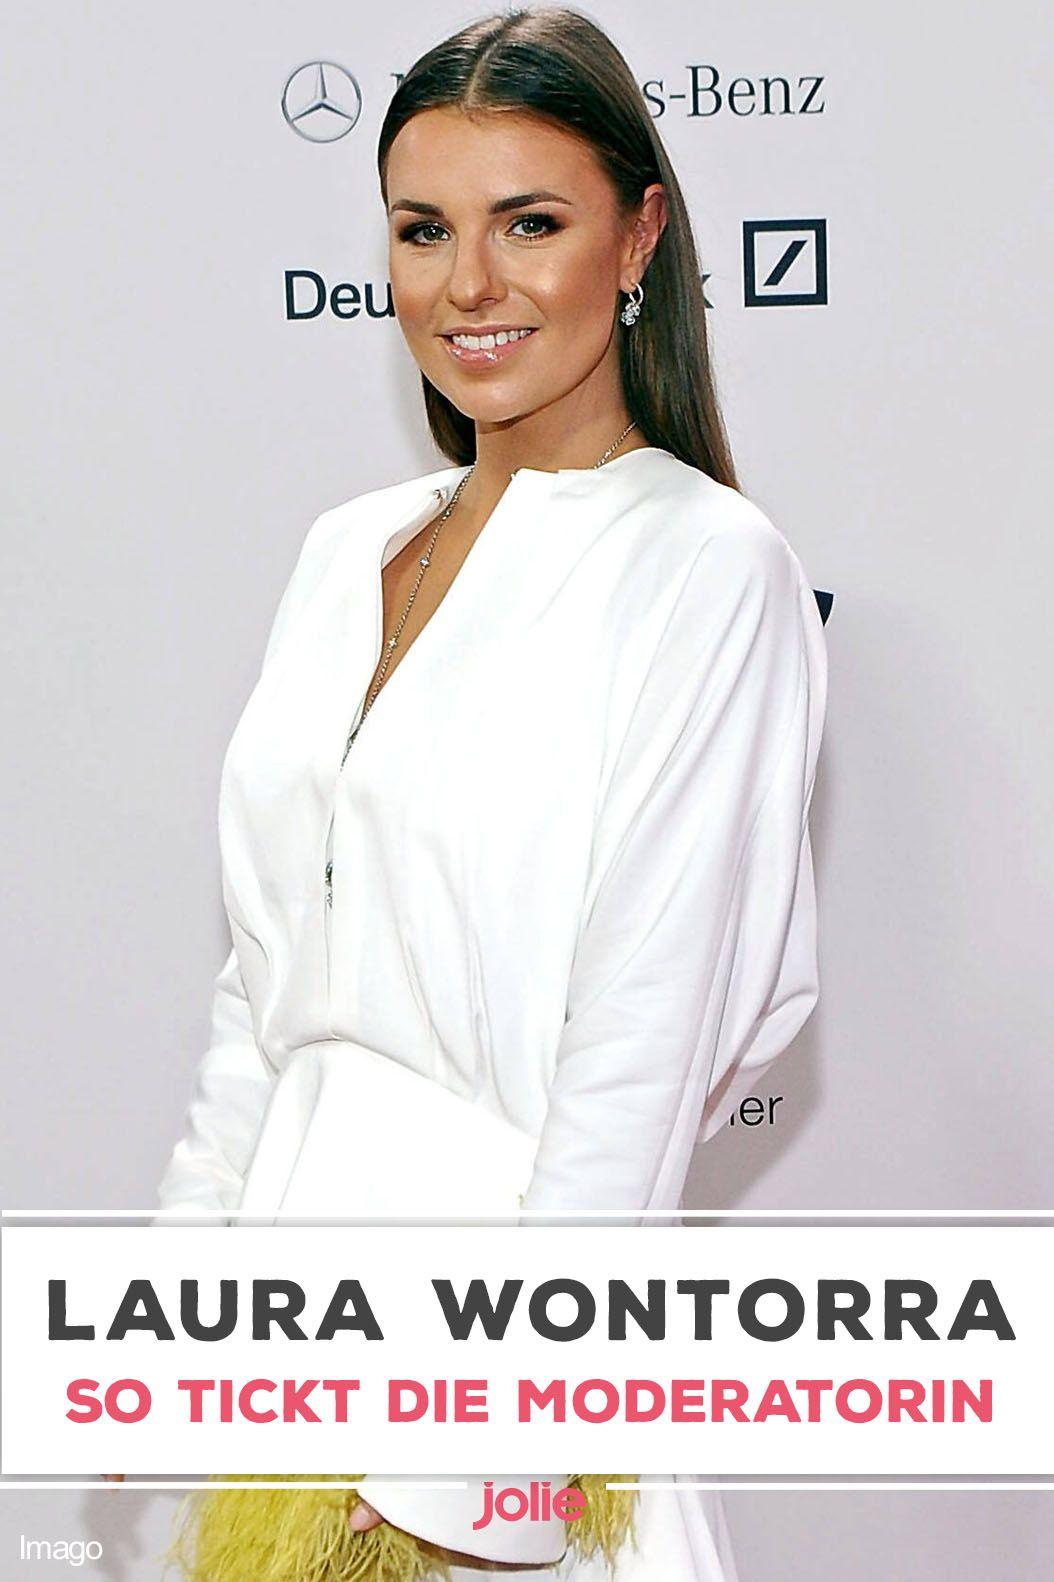 Laura Wontorra Fruher Und Heute Laura Wontorra Traumfrau Promis